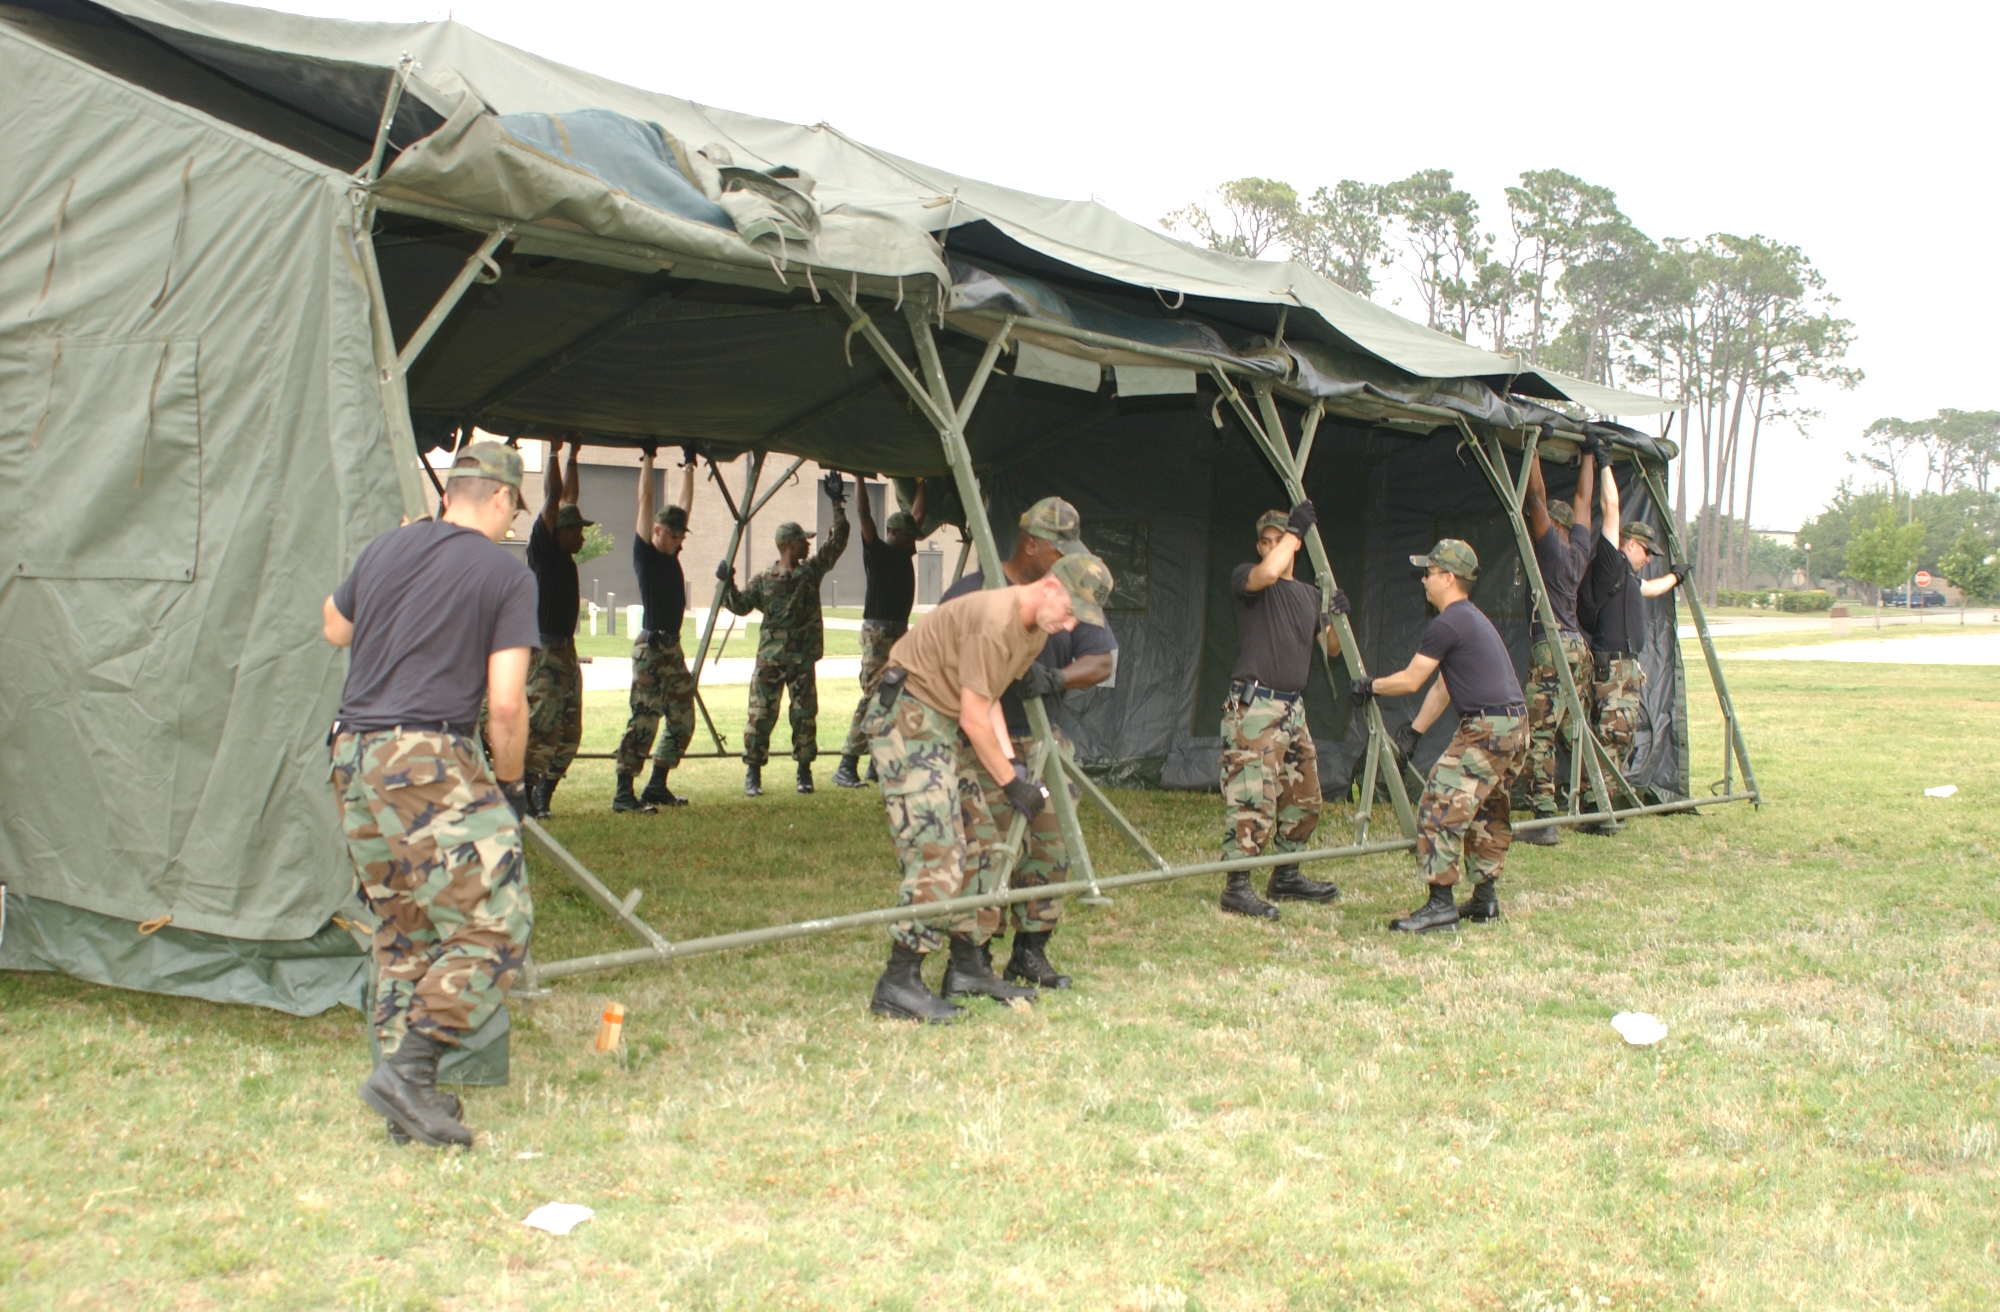 PHOTO DETAILS / DOWNLOAD HI-RES ... & Airmen Prepare For Deployment Exercise u003e Keesler Air Force Base ...